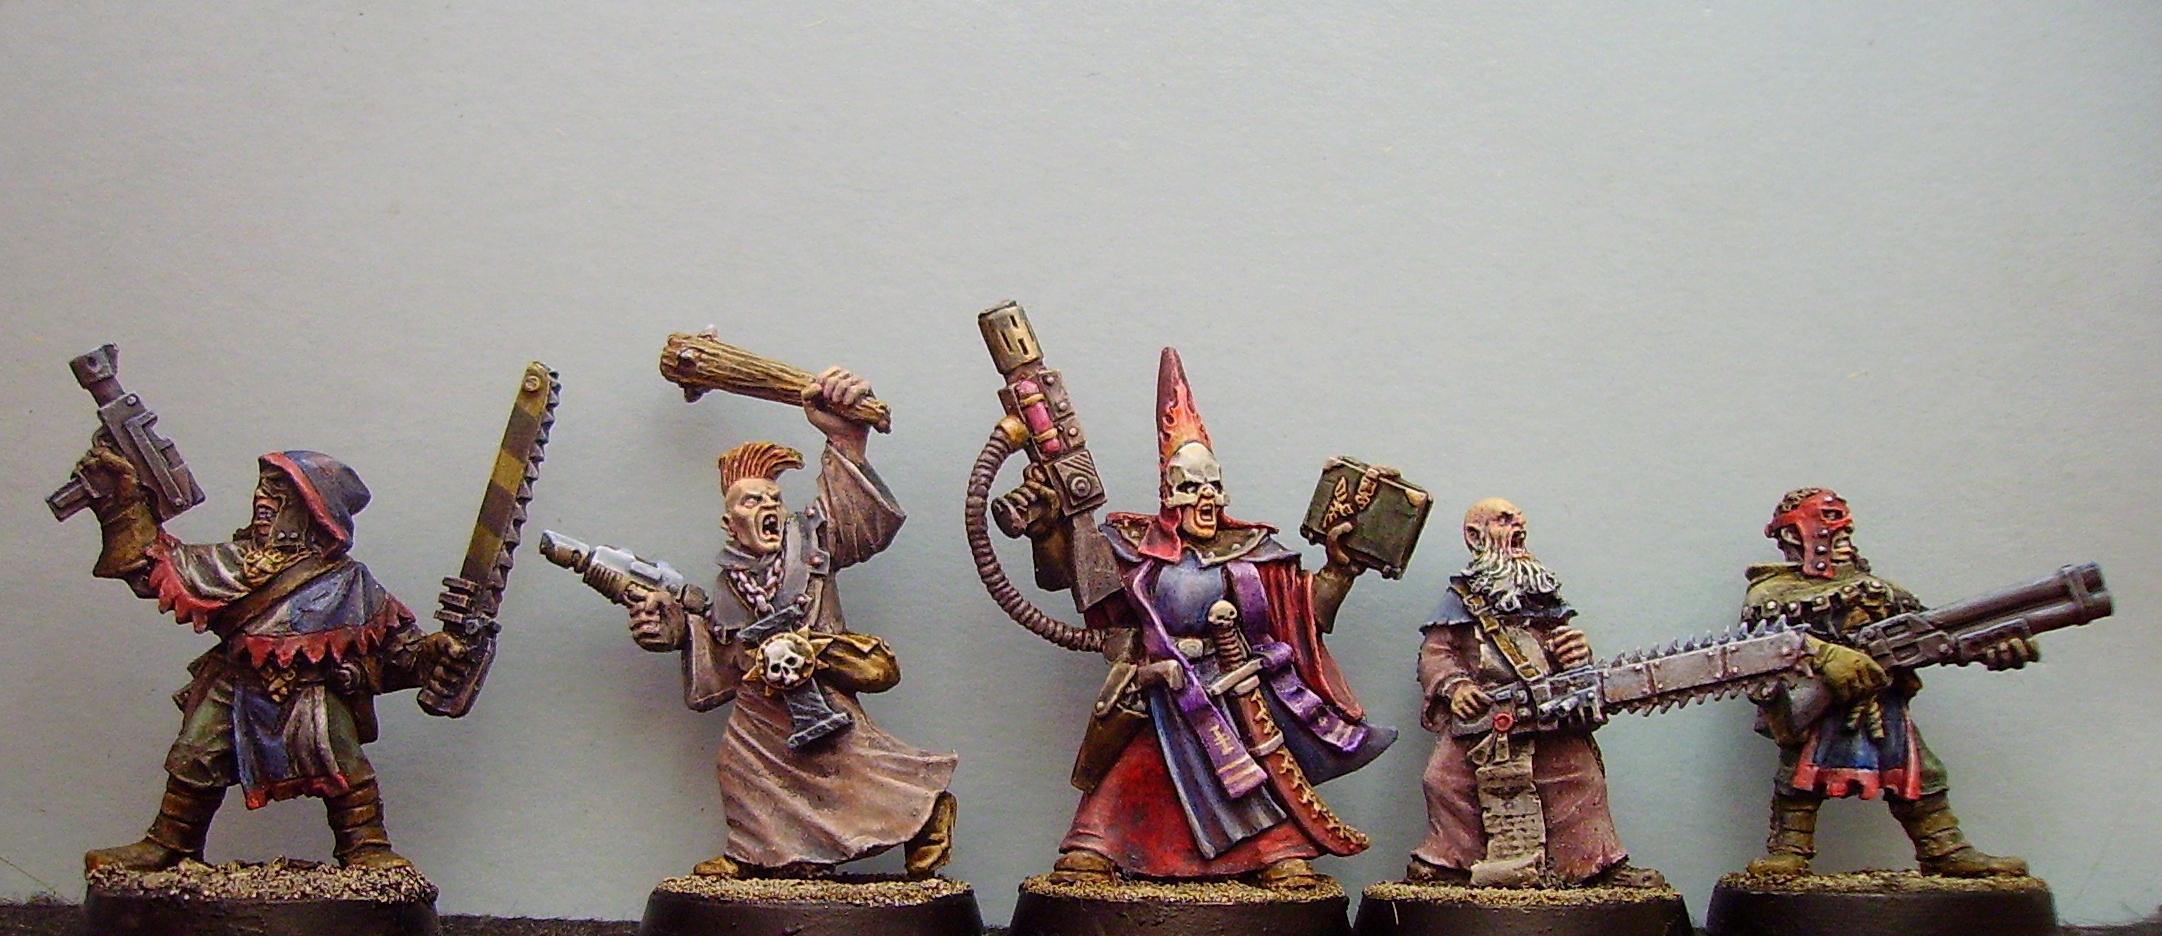 Cawdor, Necromunda, Priest, Redemptionists